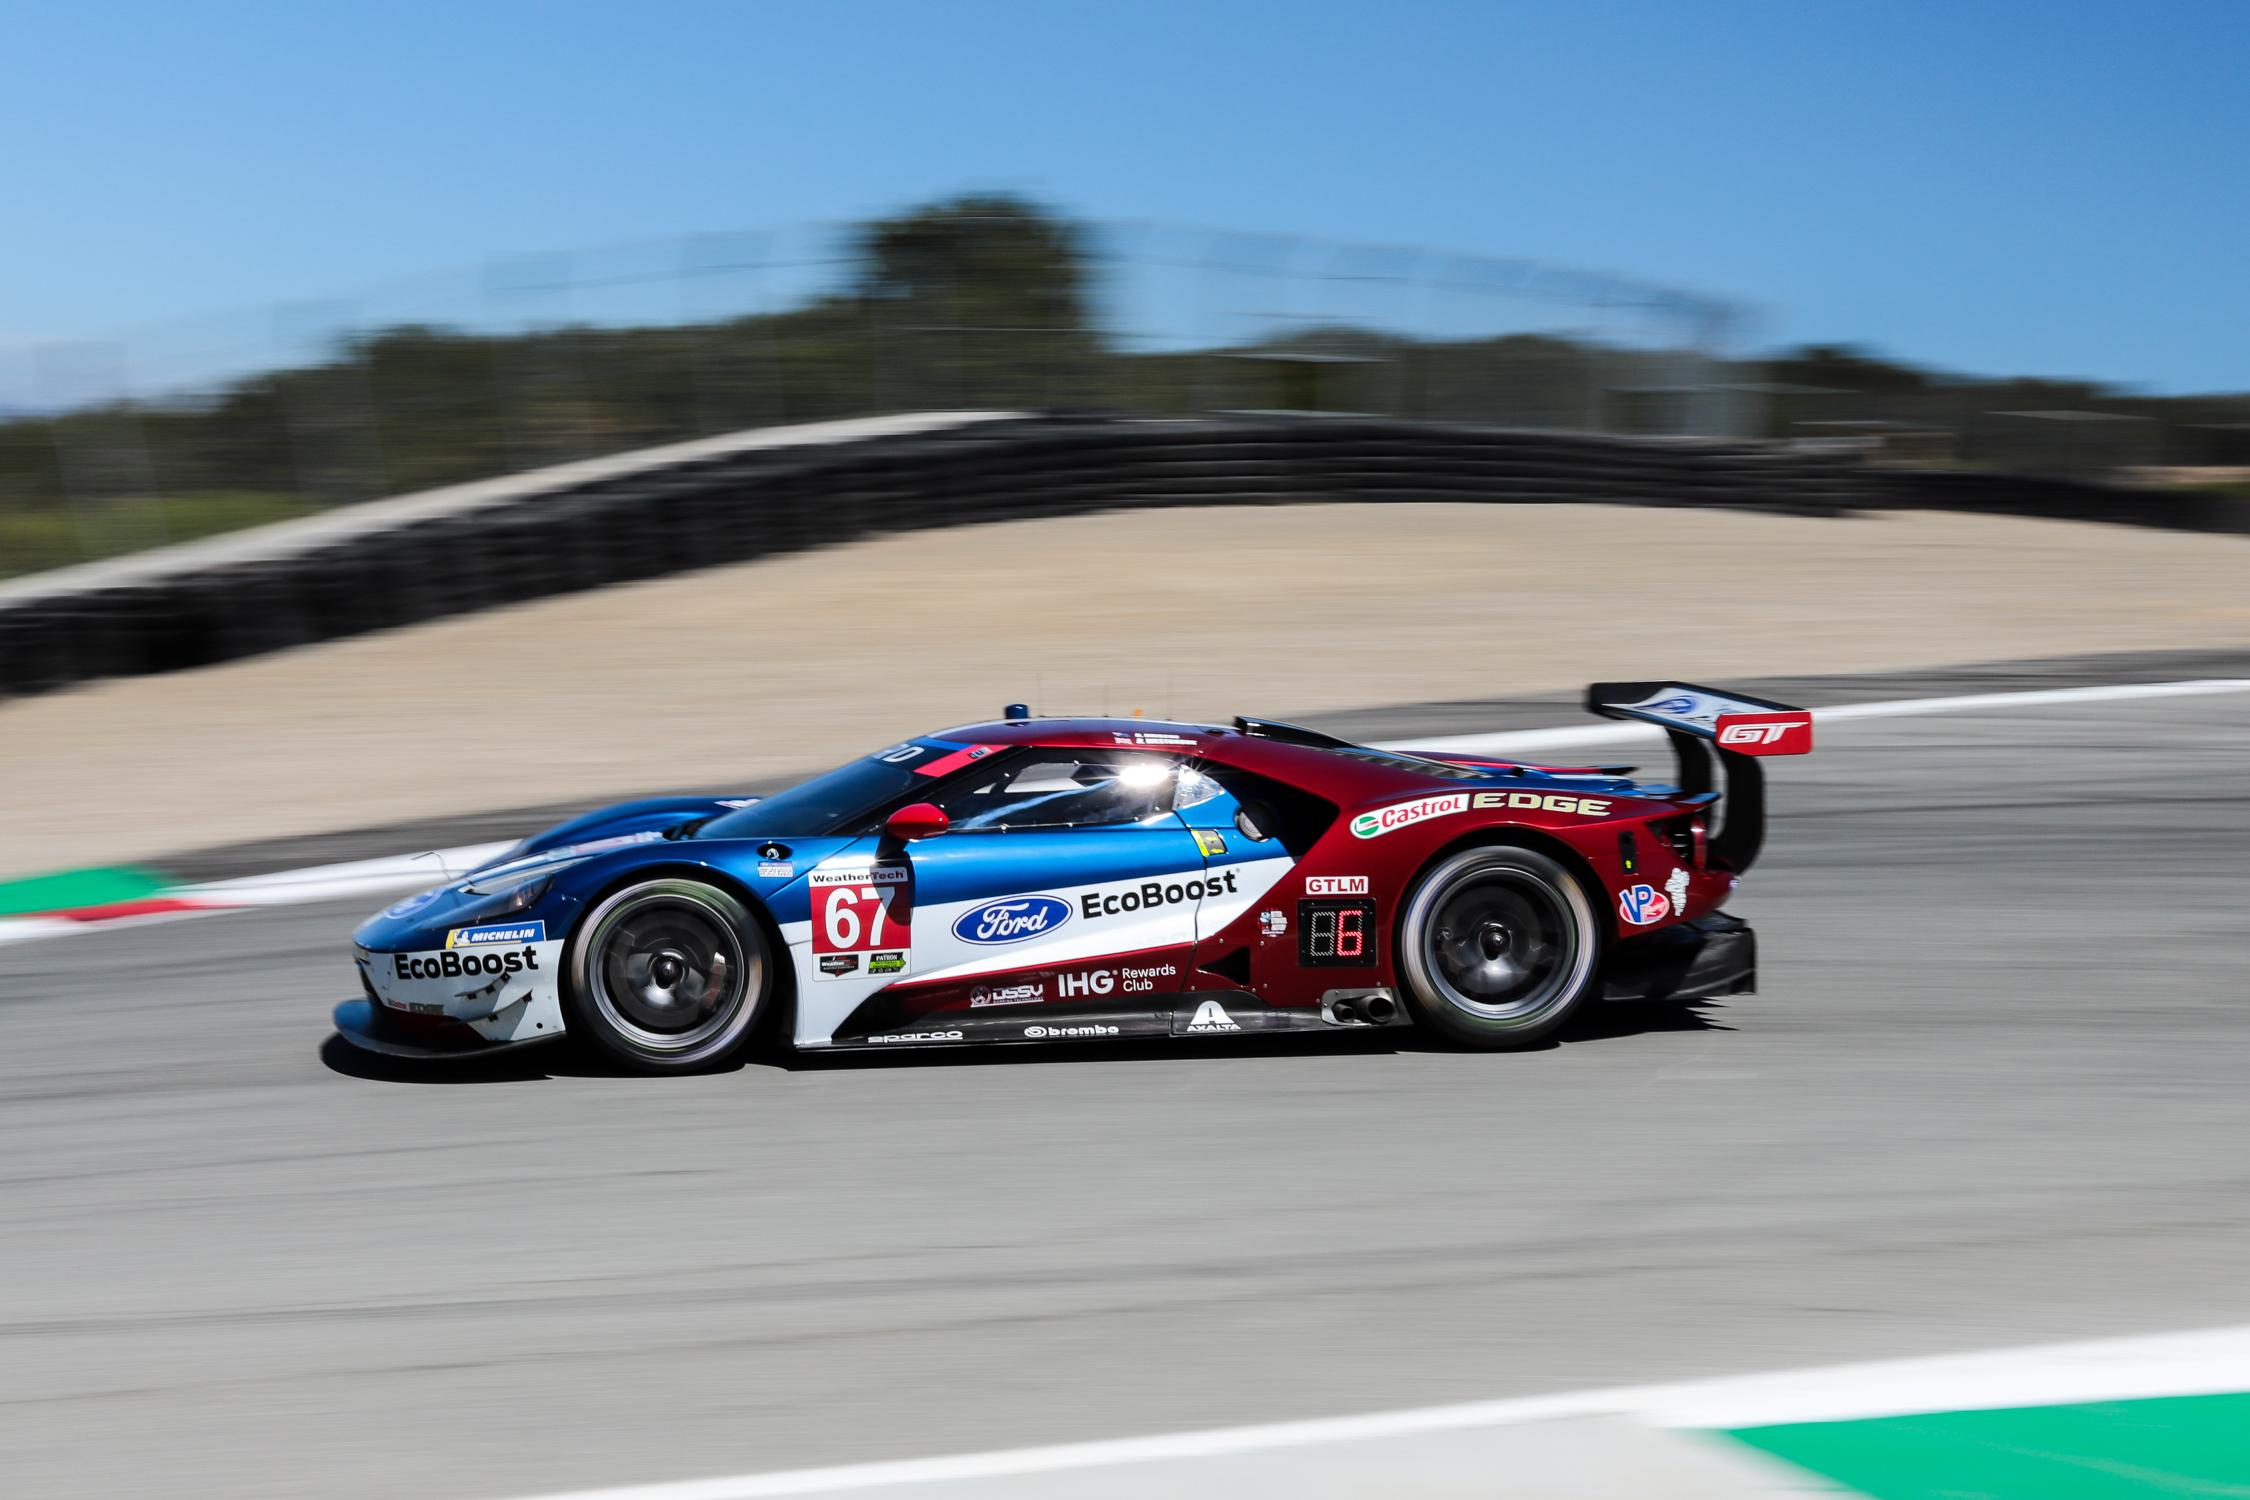 IMSA GP-1 web 18 -0329.jpg